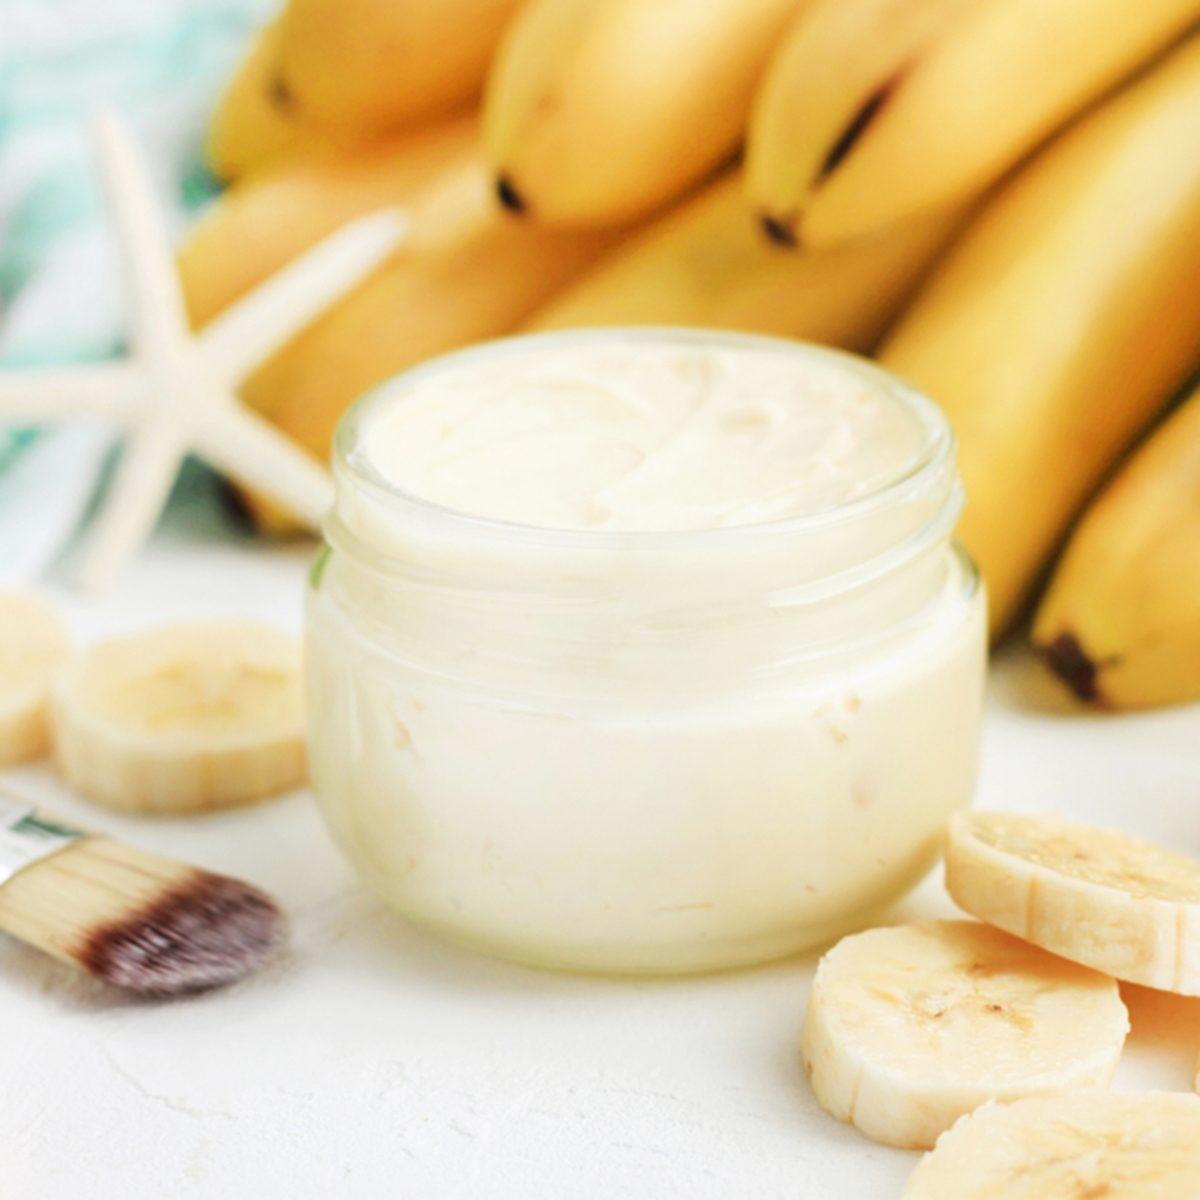 Homemade banana skincare beauty treatment mask.